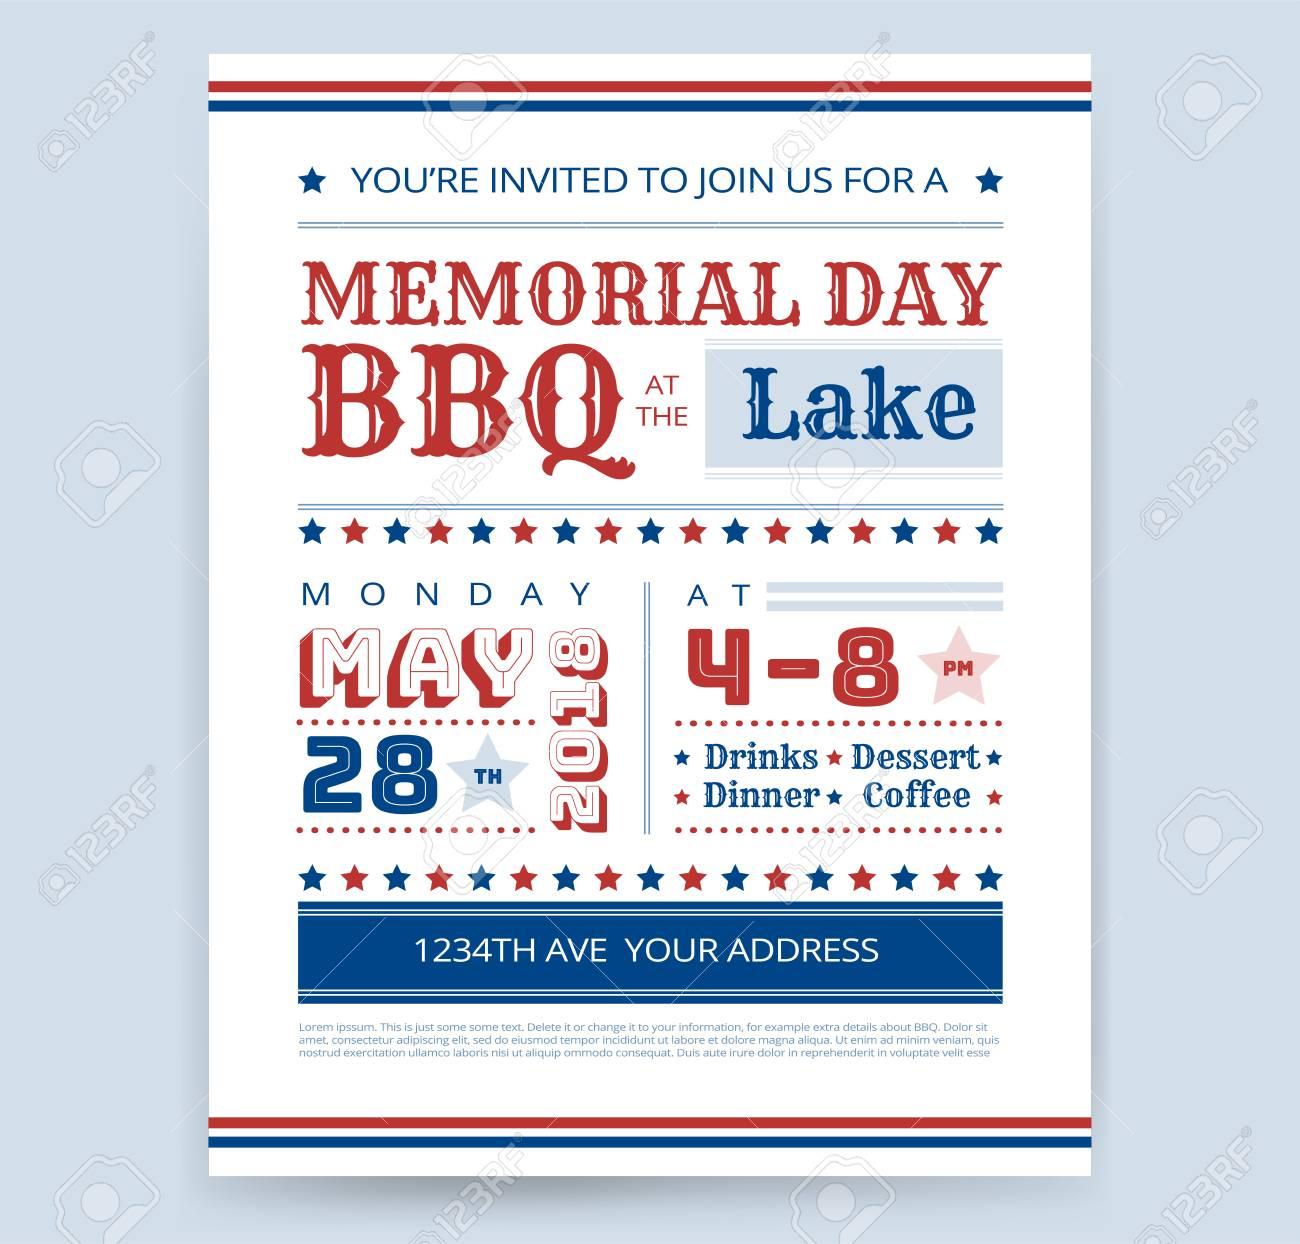 Memorial Day Barbeque Bbq Invitation Design Template Vector Barbecue